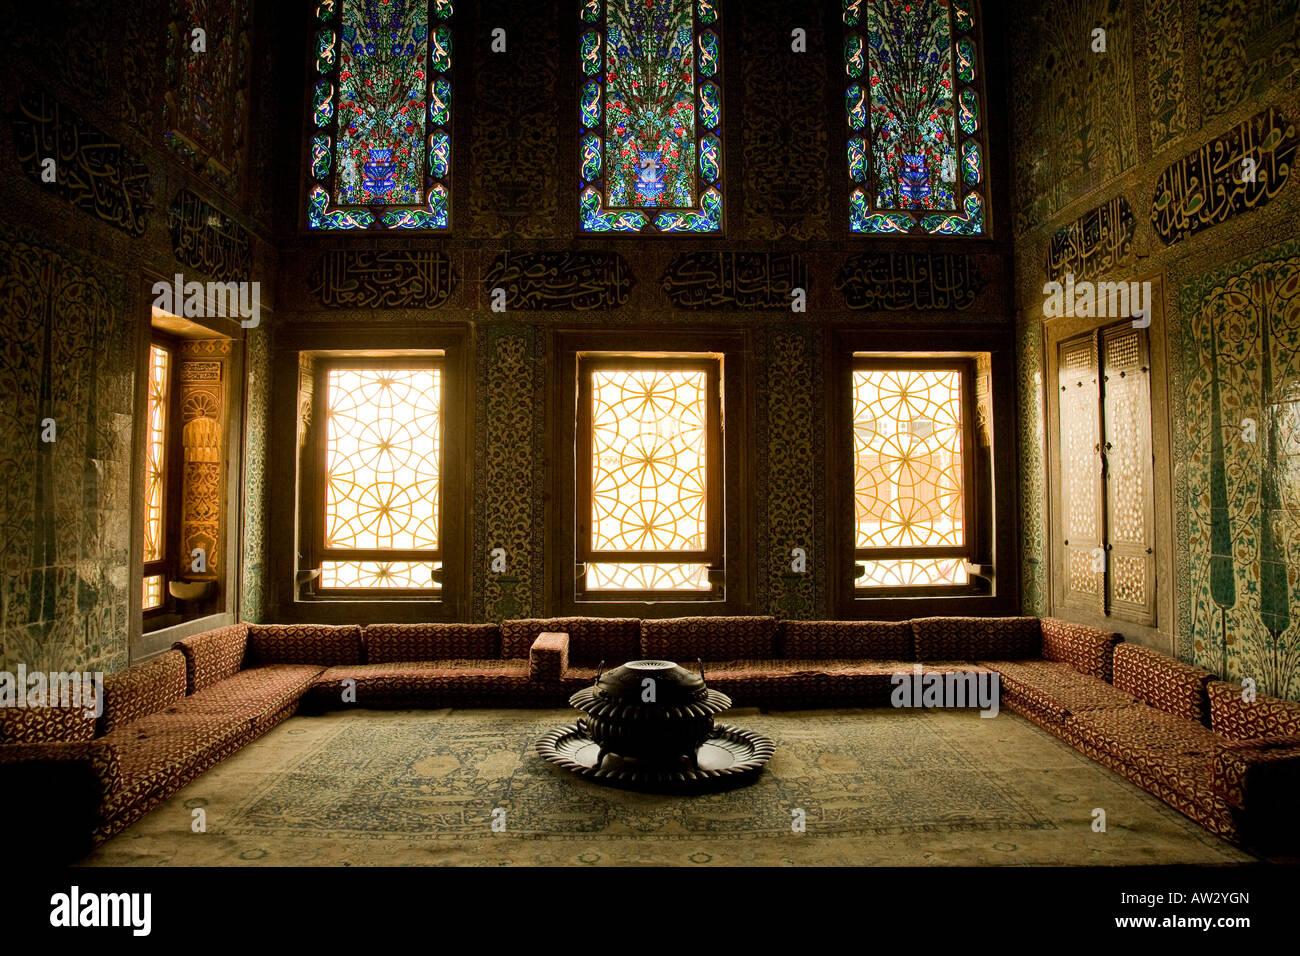 Privy Chamber, Twin Kiosk, Topkapi Palace, Istanbul Stock Photo